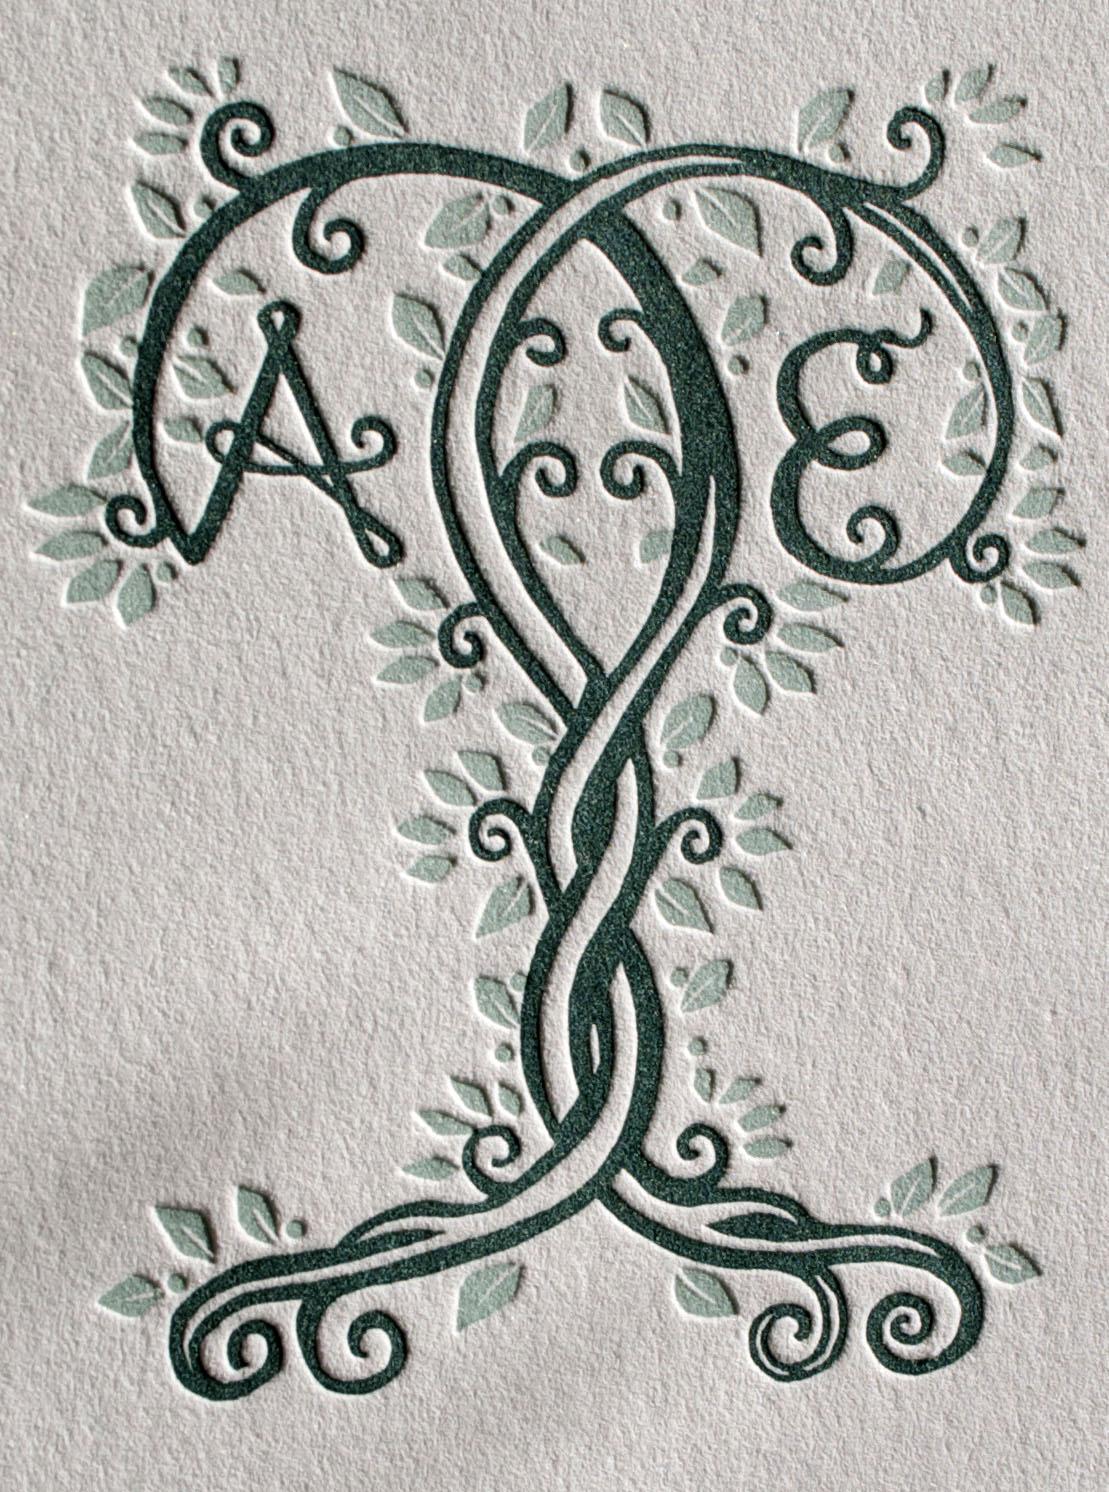 Custom bride and groom monogram design in 2 colors